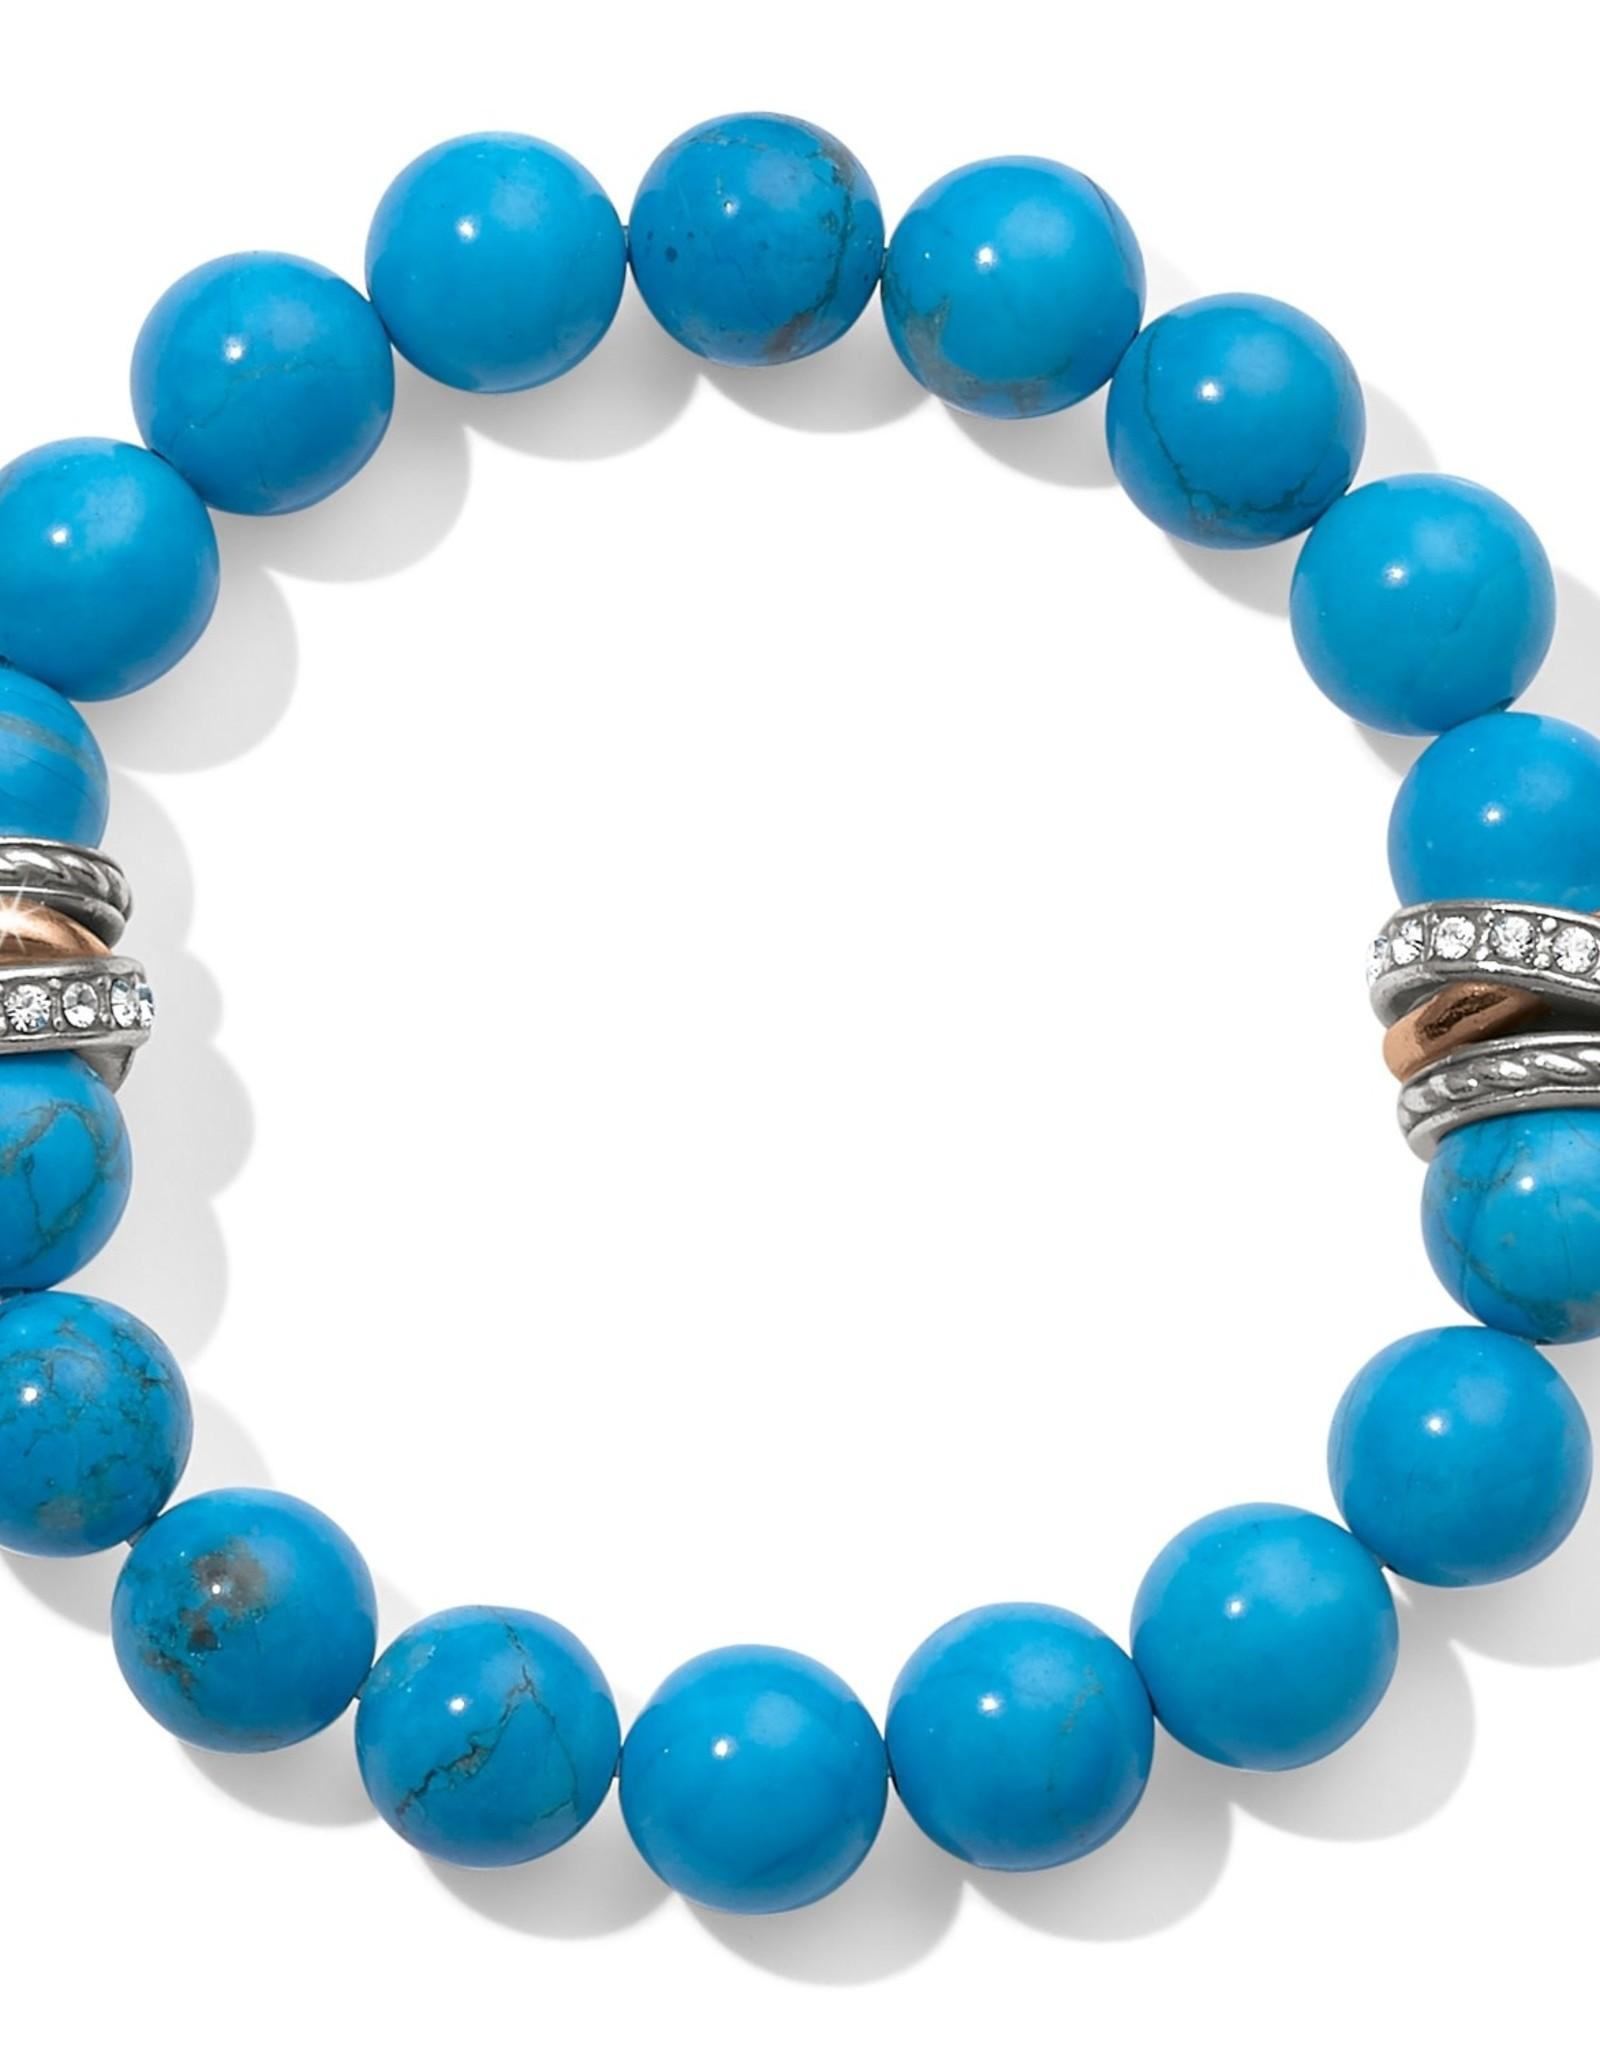 Brighton Neptune's Rings Turquoise Stretch Bracelet